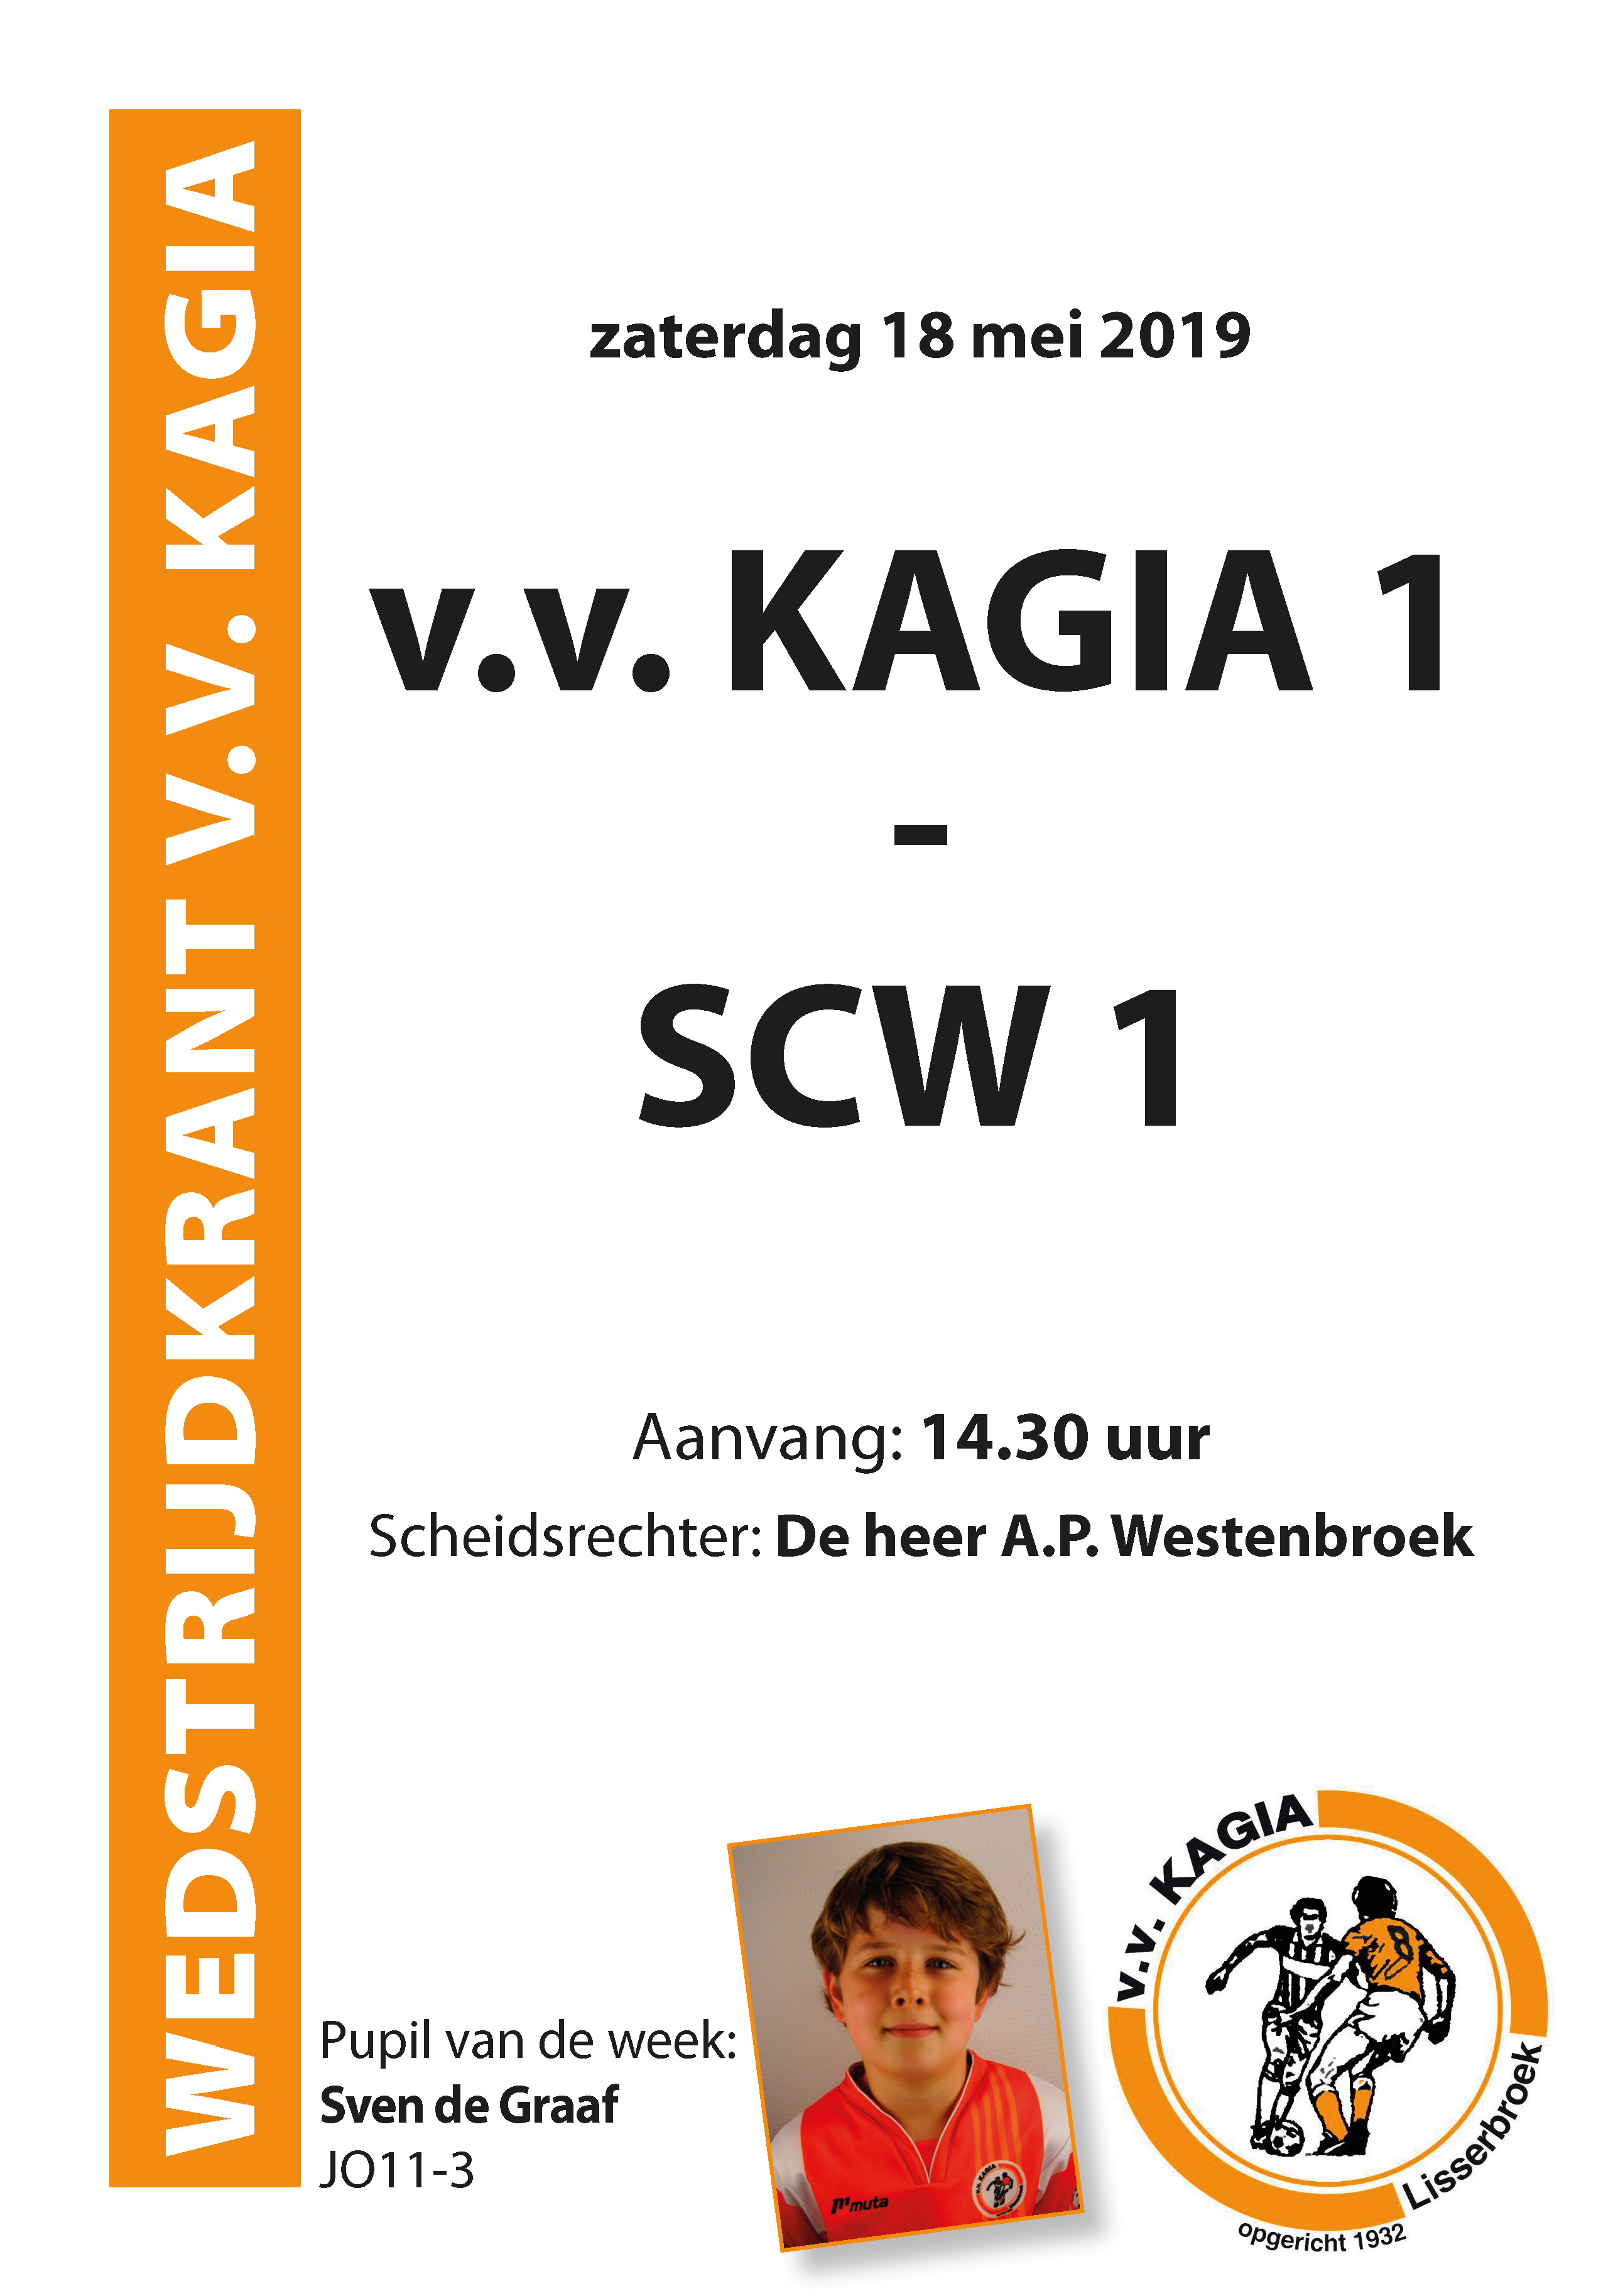 Wedstrijdkrantje | v.v. Kagia 1 – SCW 1